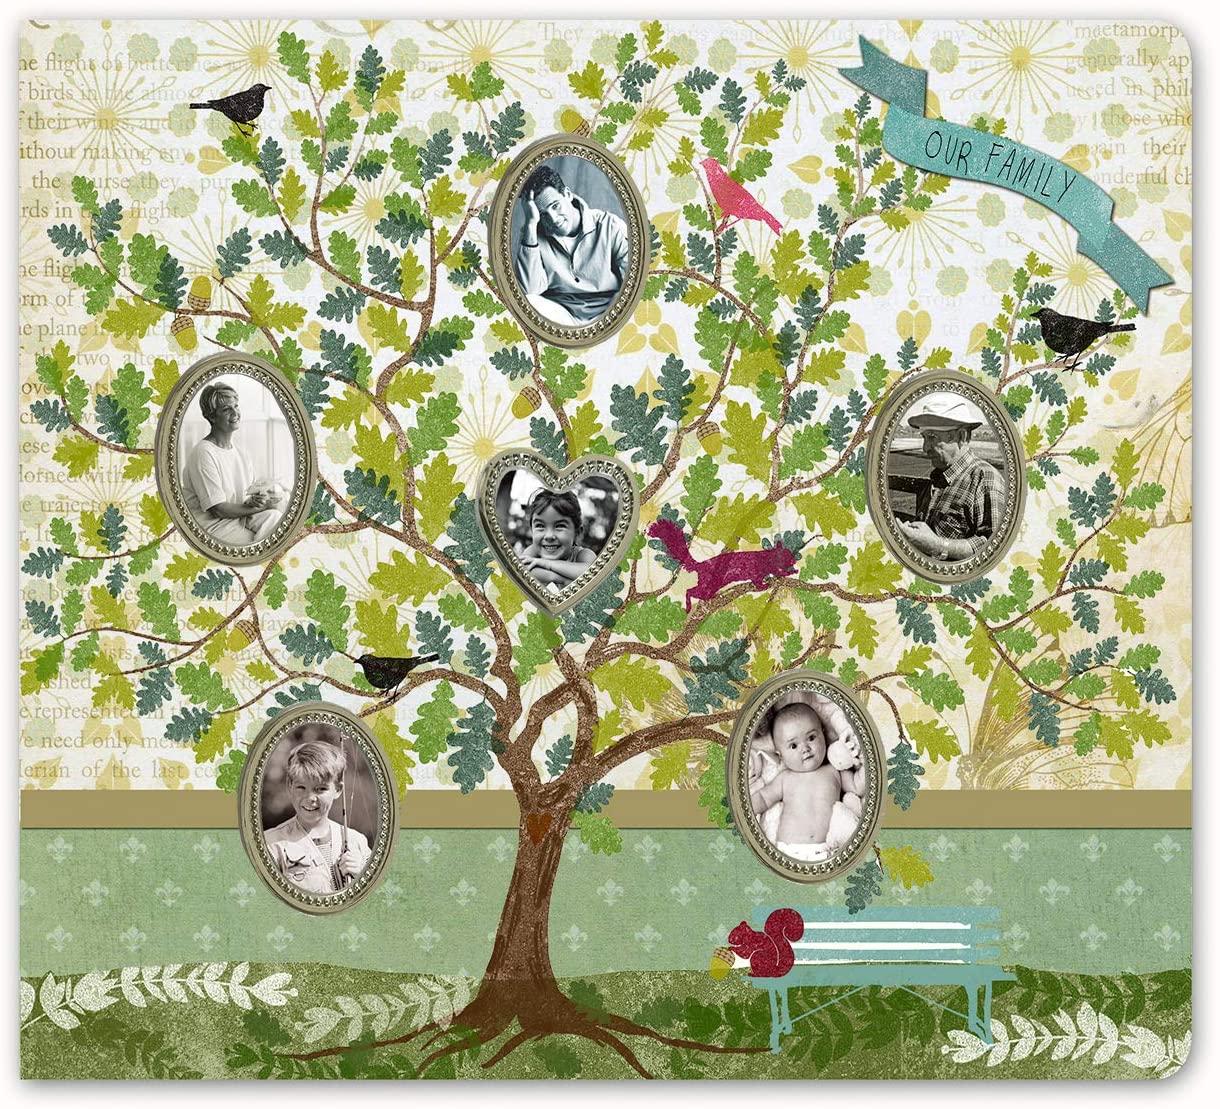 SAILINGSTORY Family Tree Photo Album 4x6 with Memo Space 200 Pockets, Family Photo Album 4x6, Family Tree Memory Book, Family Tree Photo Book